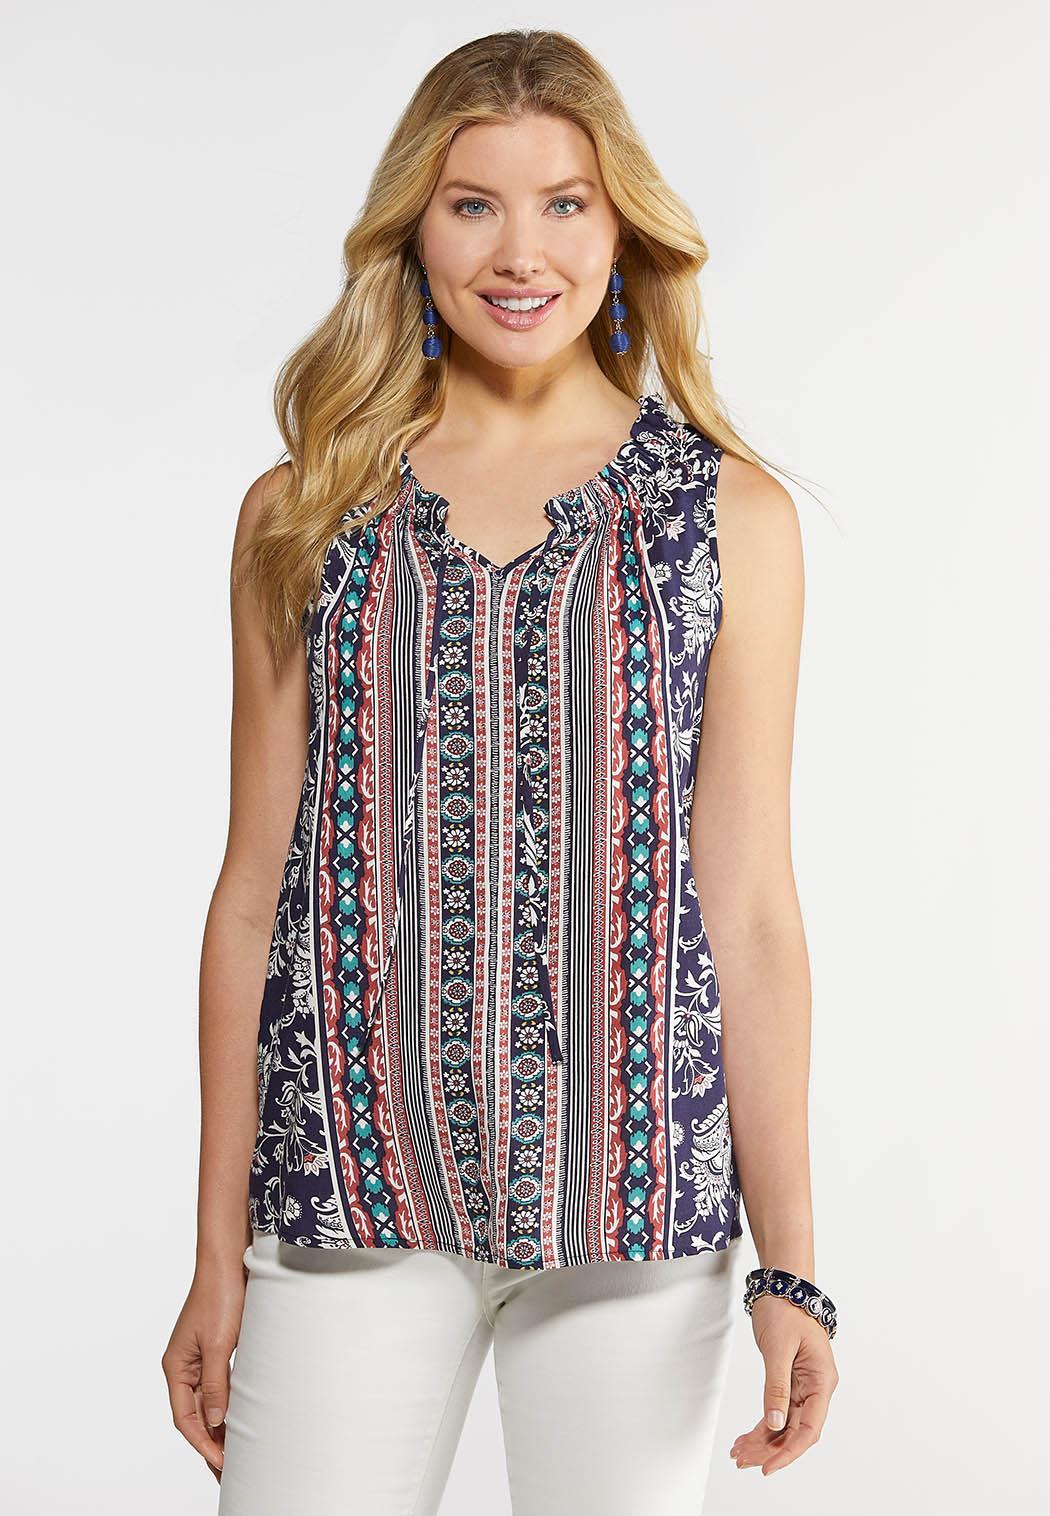 Women's Clothing Fashion Women Casual Summer Sleeveless Top Vest Blouse Pocket Ladies Shirt Tops